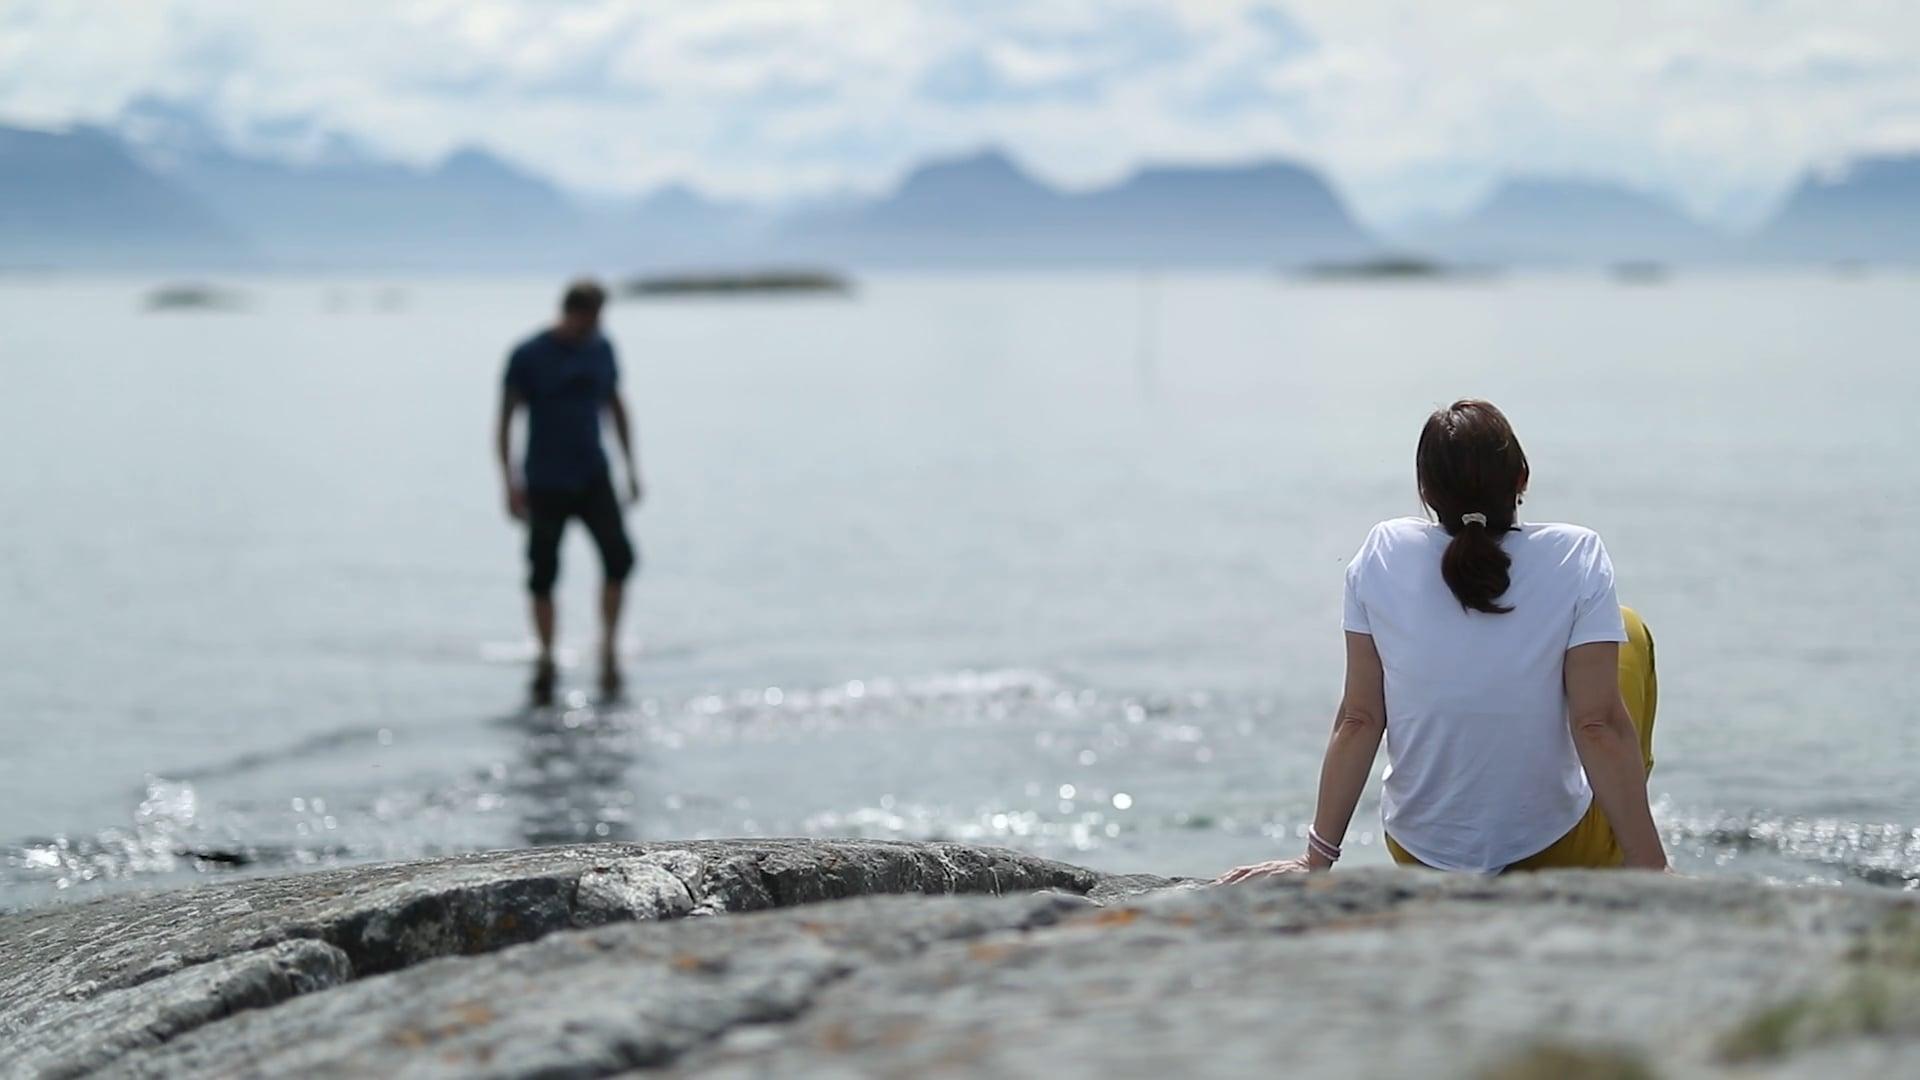 Øyriket i Romsdal